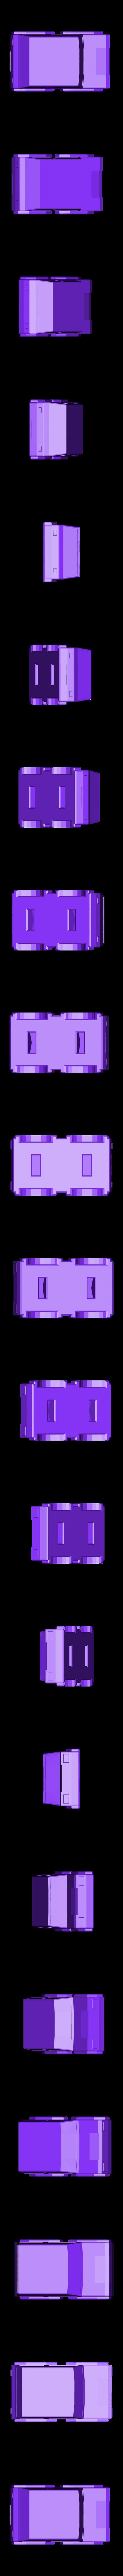 SmallToys-BodyCar1.stl Download STL file SmallToys - Cars pack • 3D print design, Wabby